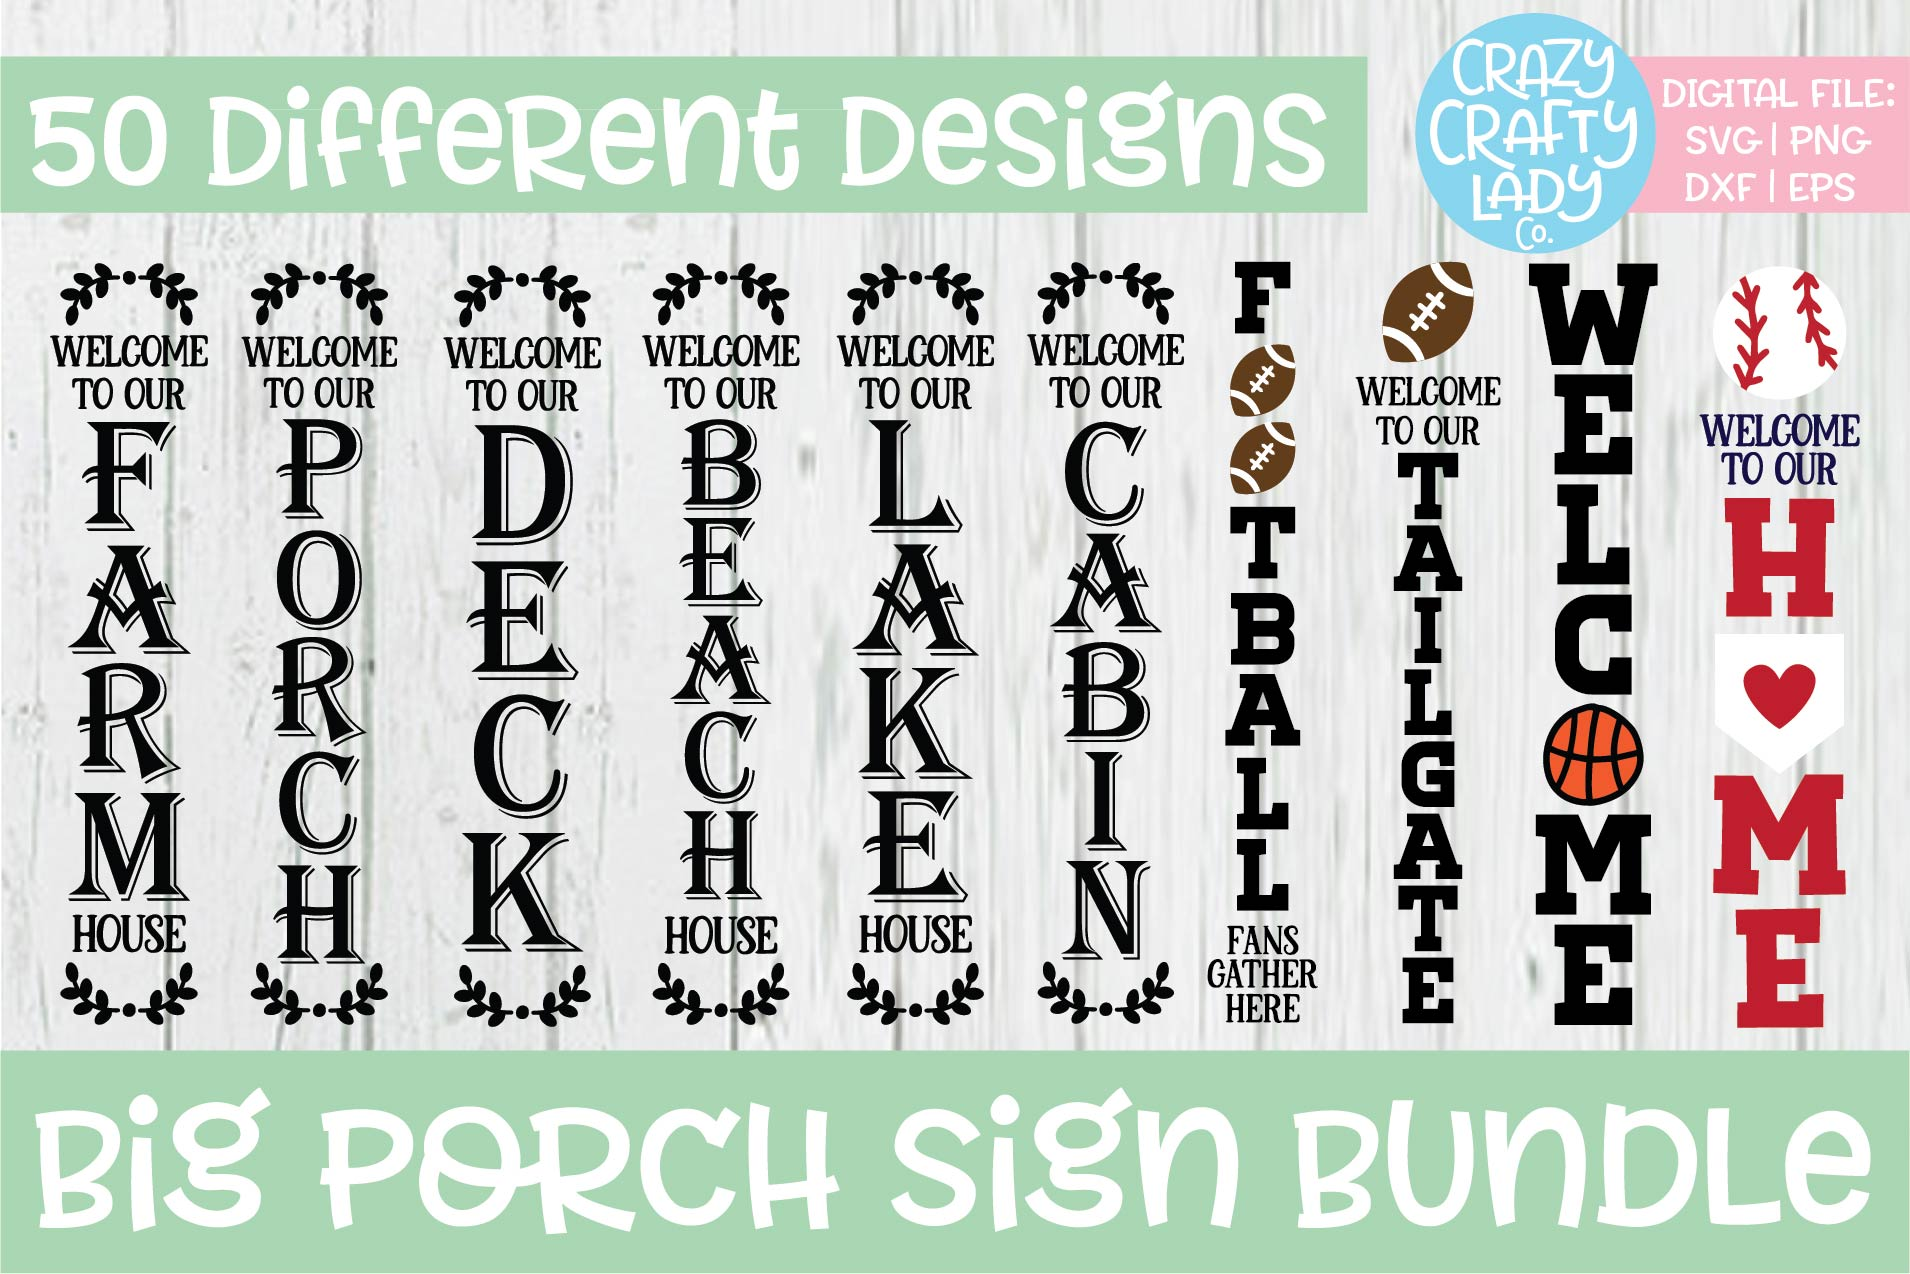 Big Porch Sign SVG DXF EPS PNG Cut File Bundle example image 2